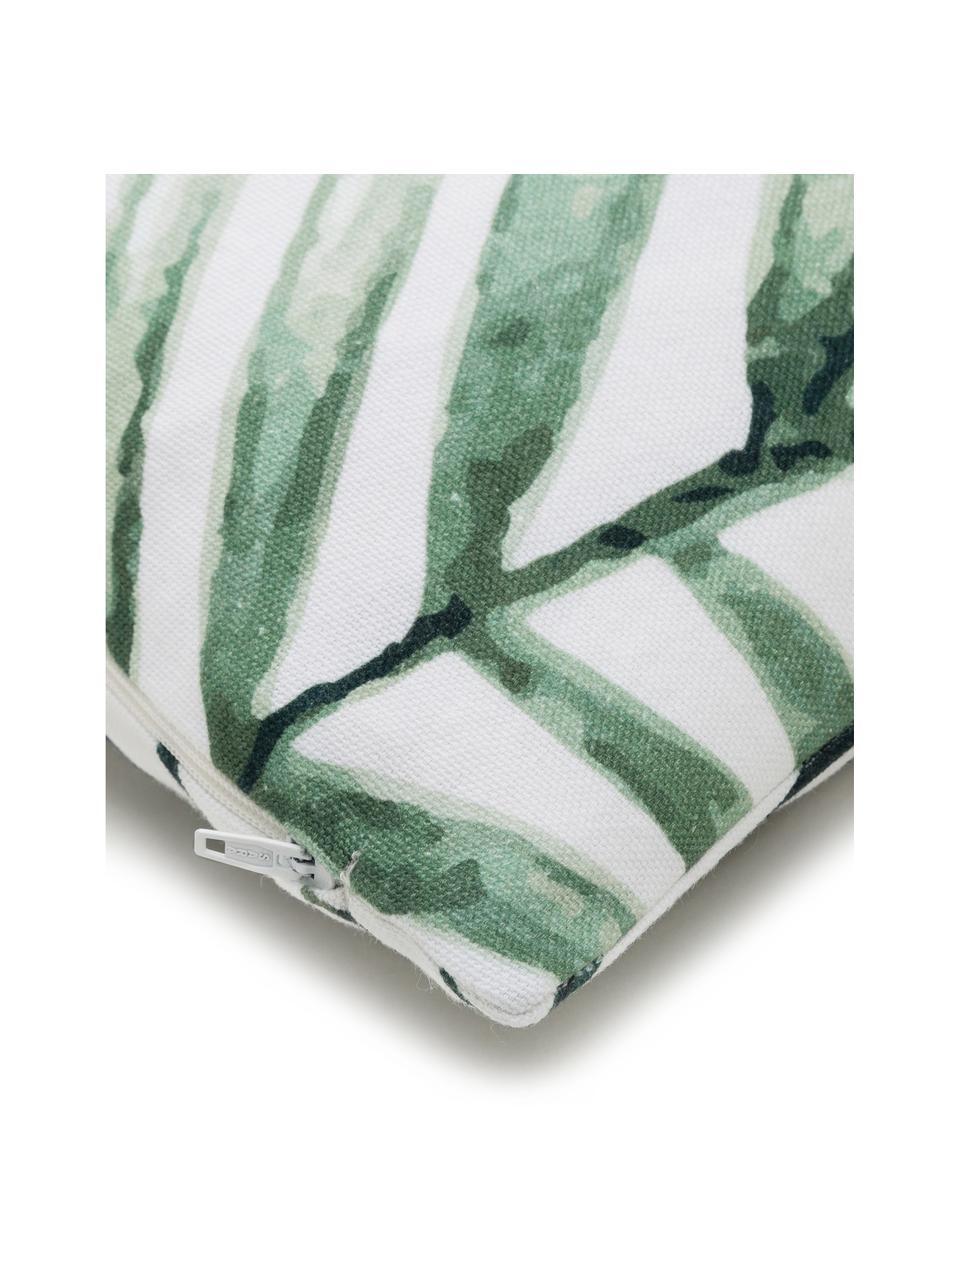 Kissenhülle Coast mit Blattmuster, 100% Baumwolle, Grün, Weiß, 40 x 40 cm